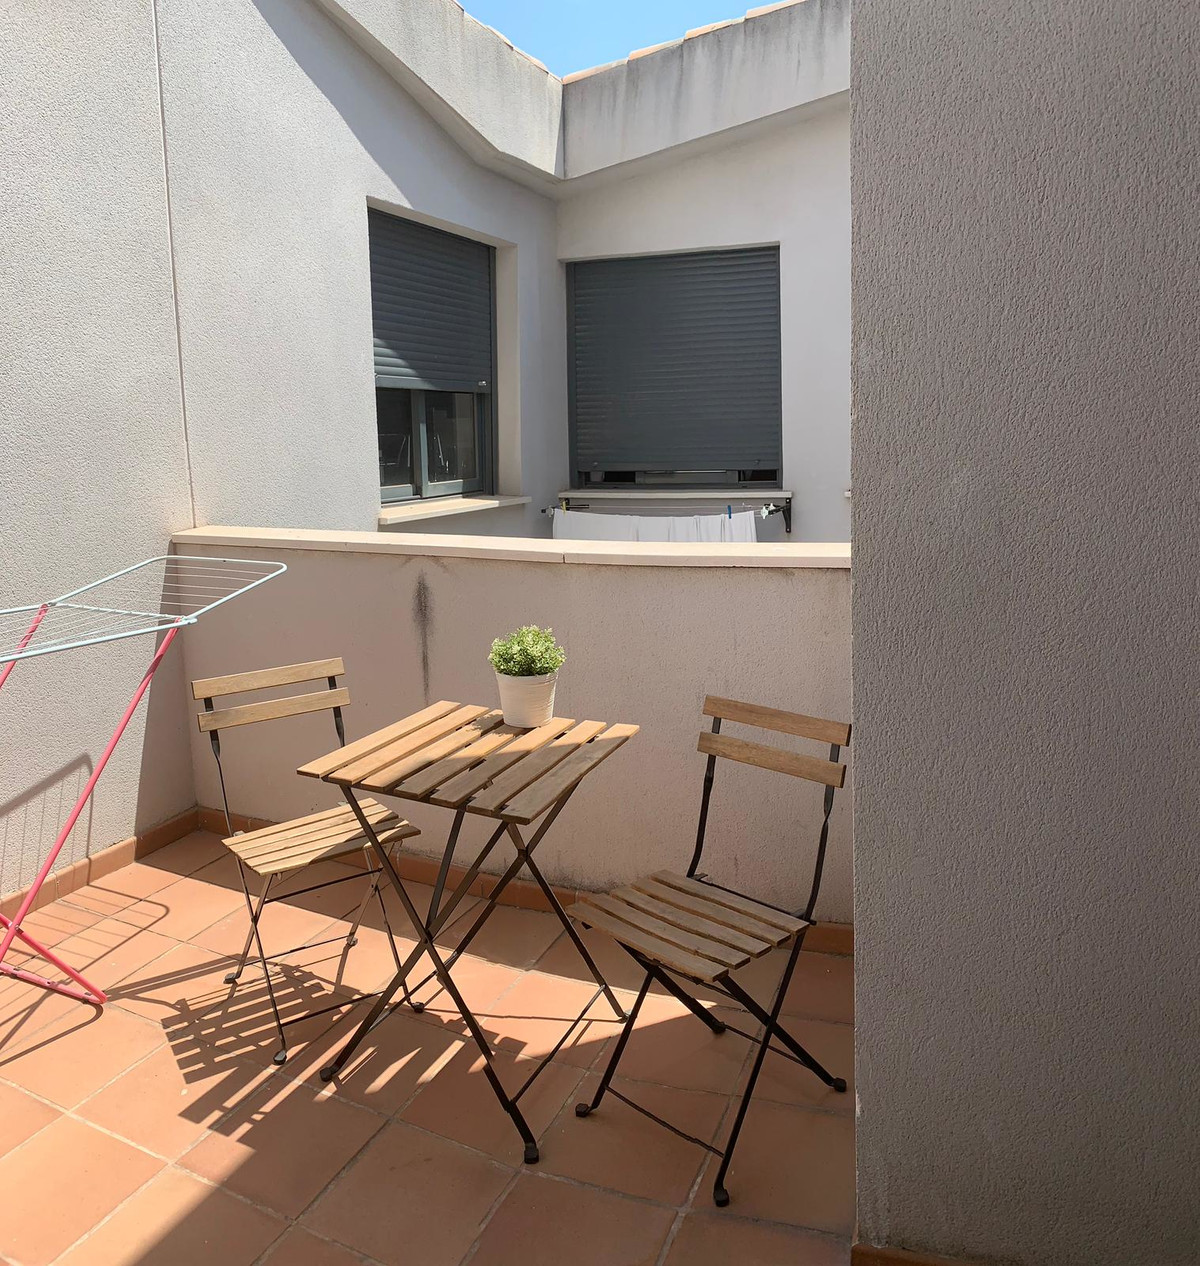 Penthouse Duplex, Malaga 10mn historic Centre, Costa del Sol. 1 Bedroom, 1 Bathroom, Built 45m2;. Ne,Spain